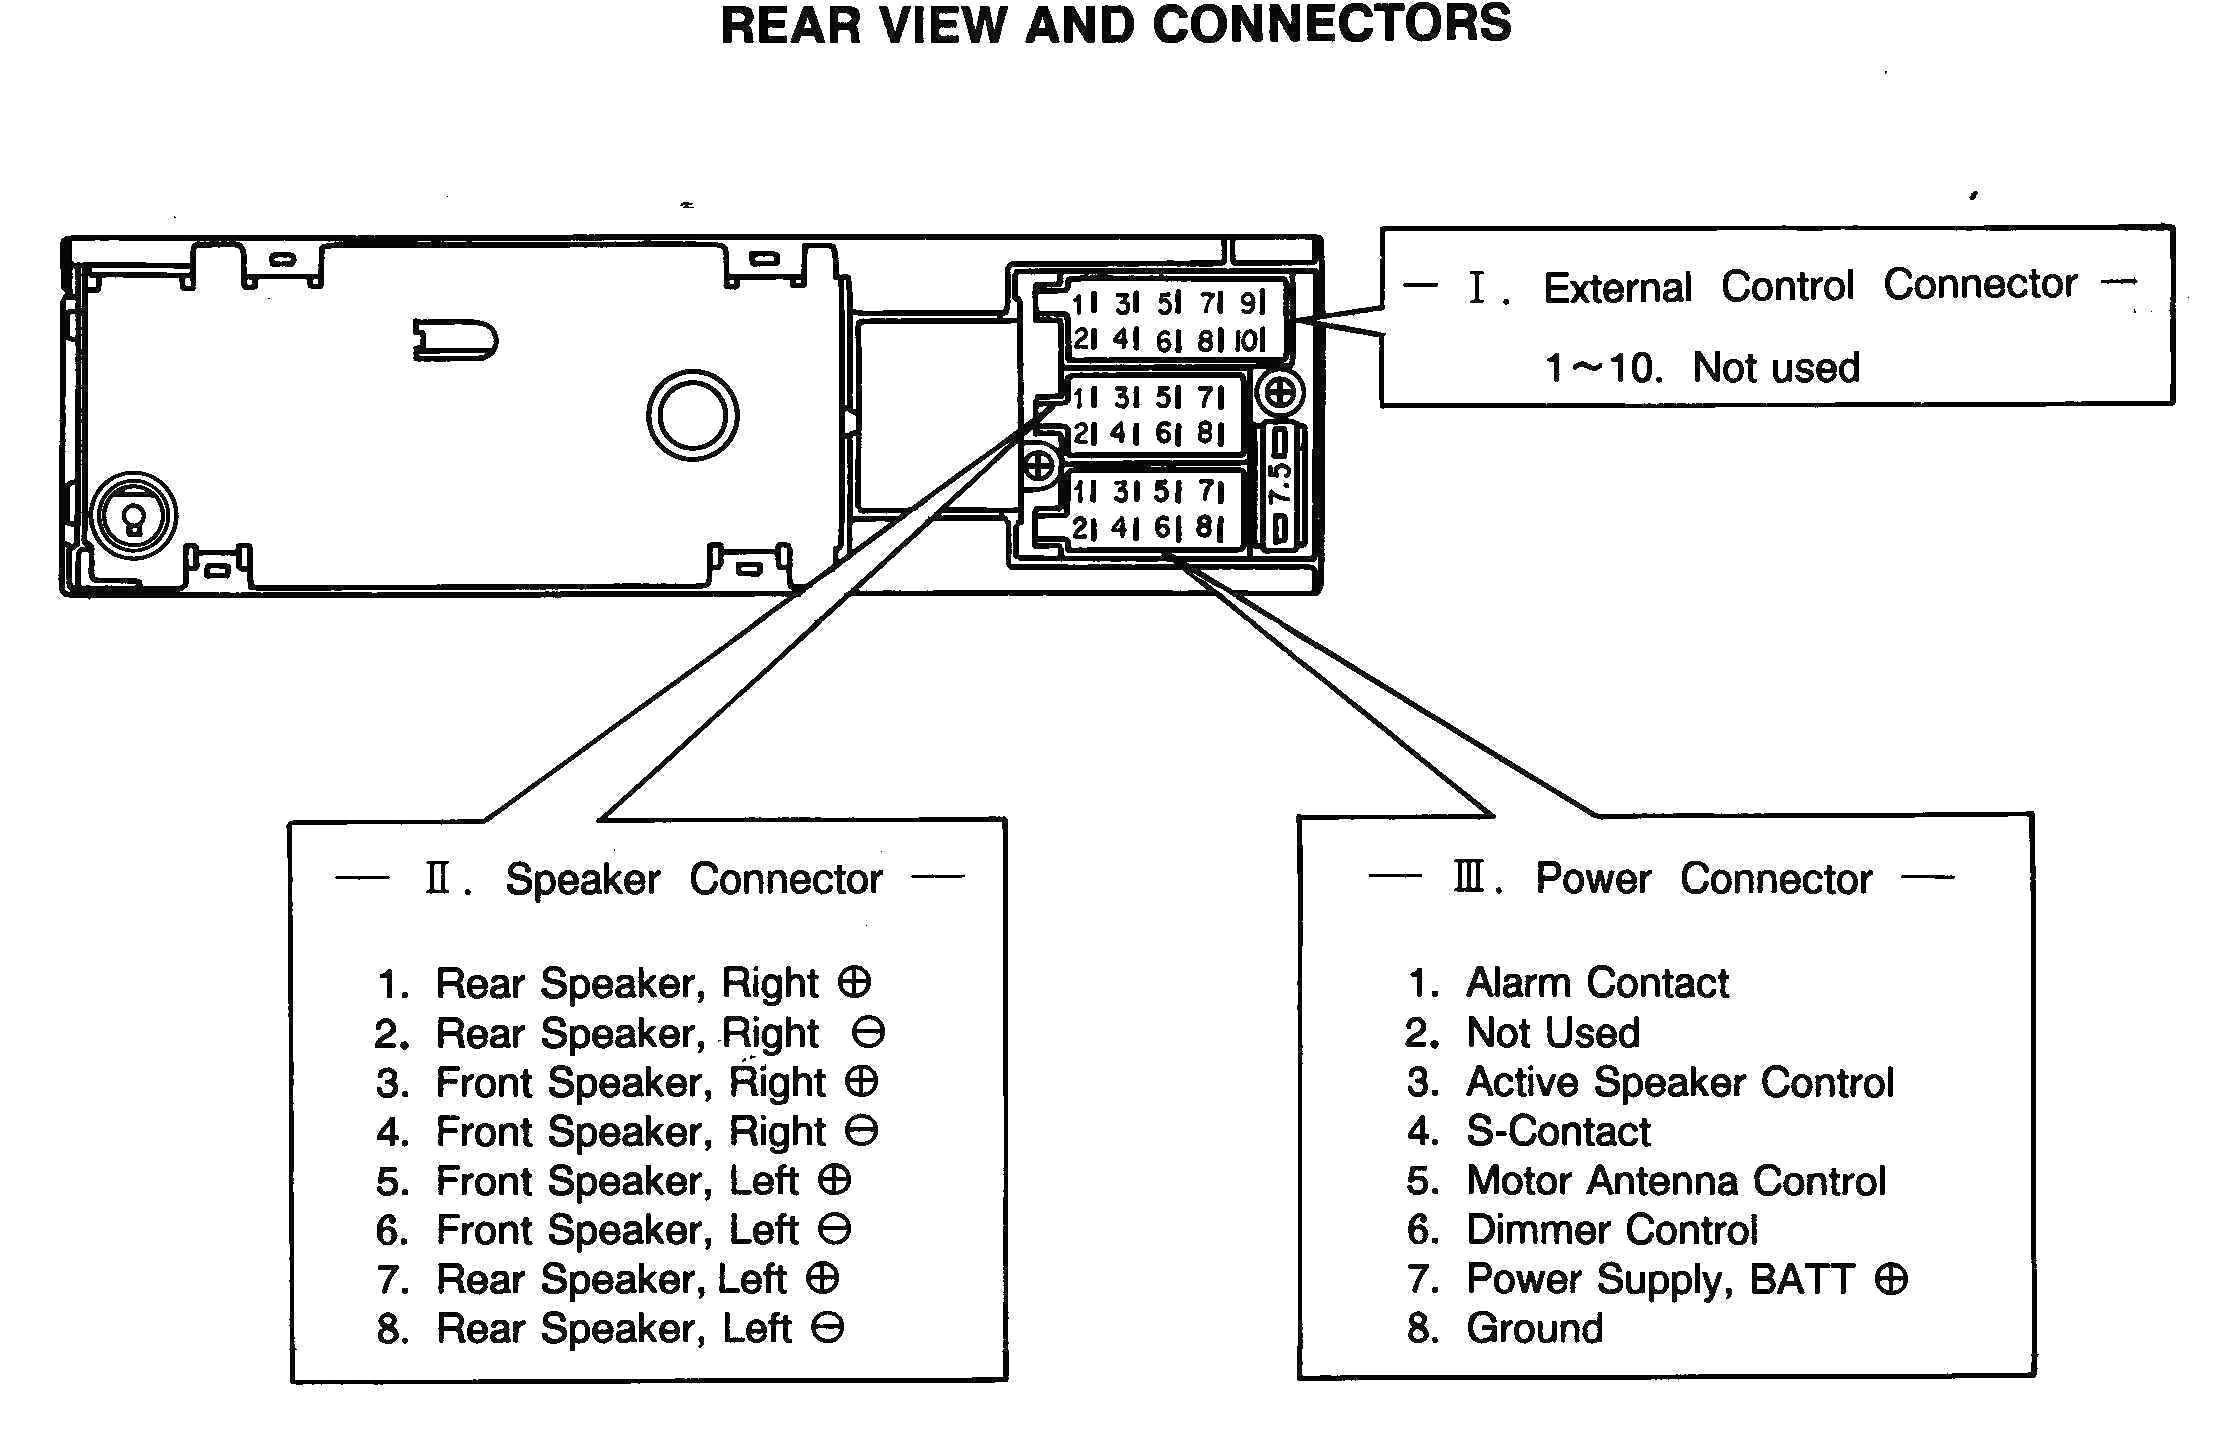 2000 Vw Jetta Radio Wiring Diagram To Boseaudio Jpg Beautiful Mitsubishi Resize U003d665 2C432 For Harley